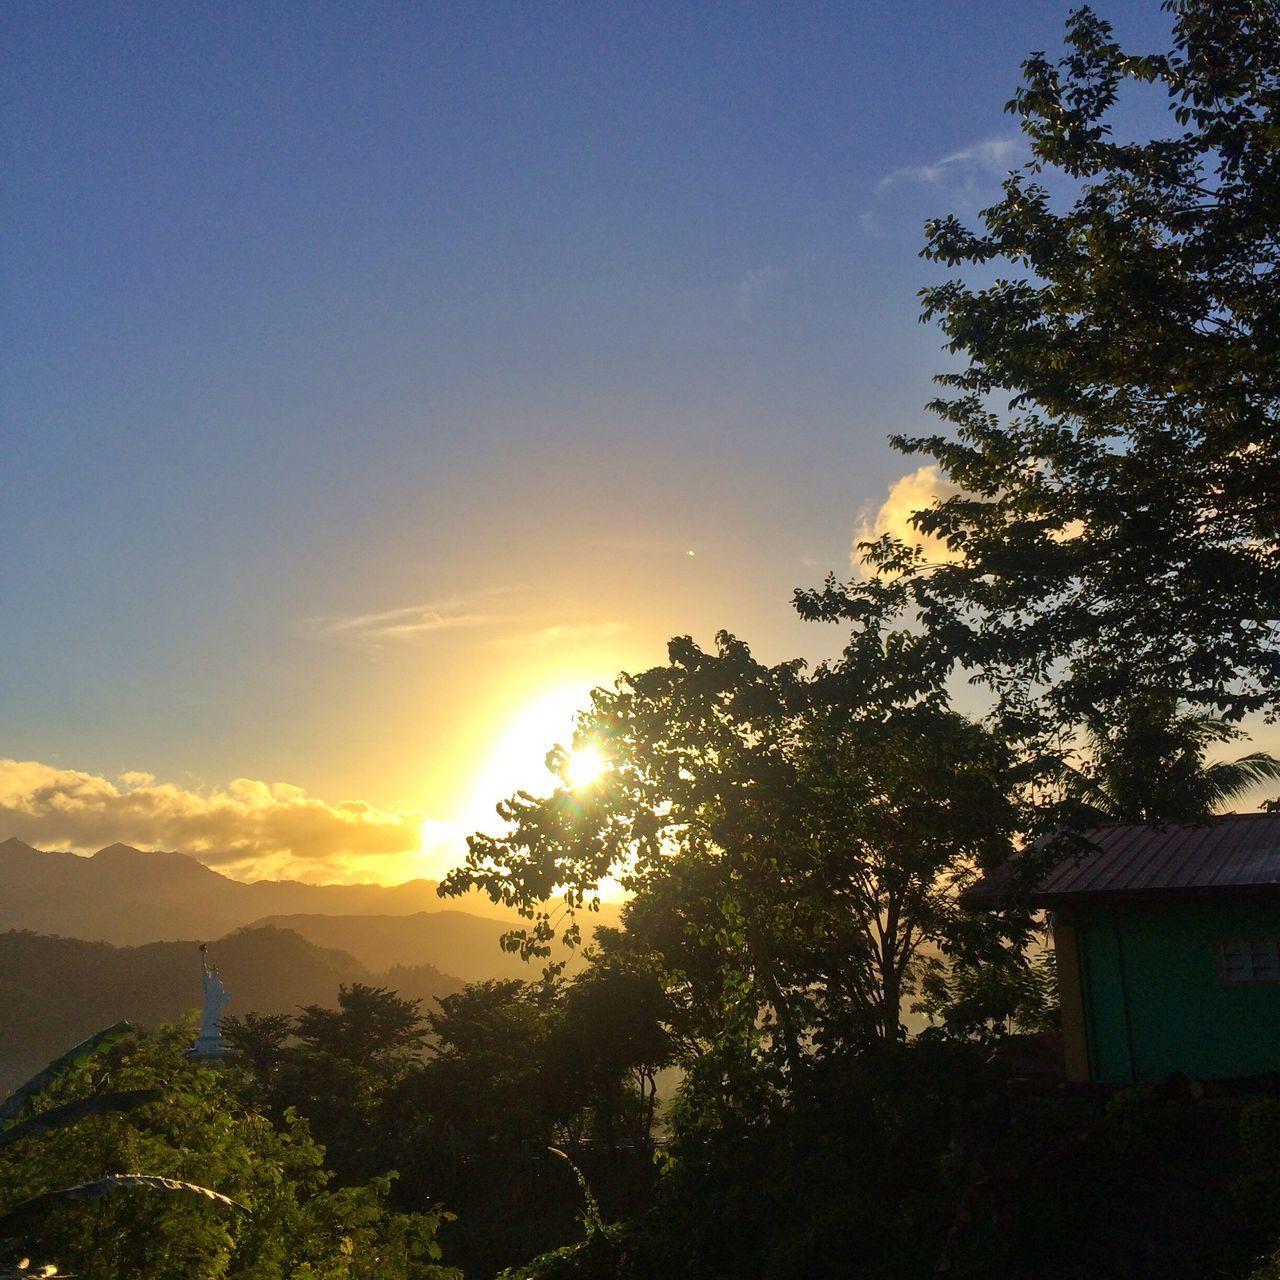 View from Rizal. Philippines Rizal TanayRizal Tanay,rizal No People Beauty In Nature Sky Tree Nature Sunlight Scenics Sunbeam Outdoorsa:mountain]] Day Morning Light Morning Sky Morning Sun Mornings Morning View Morning Walk